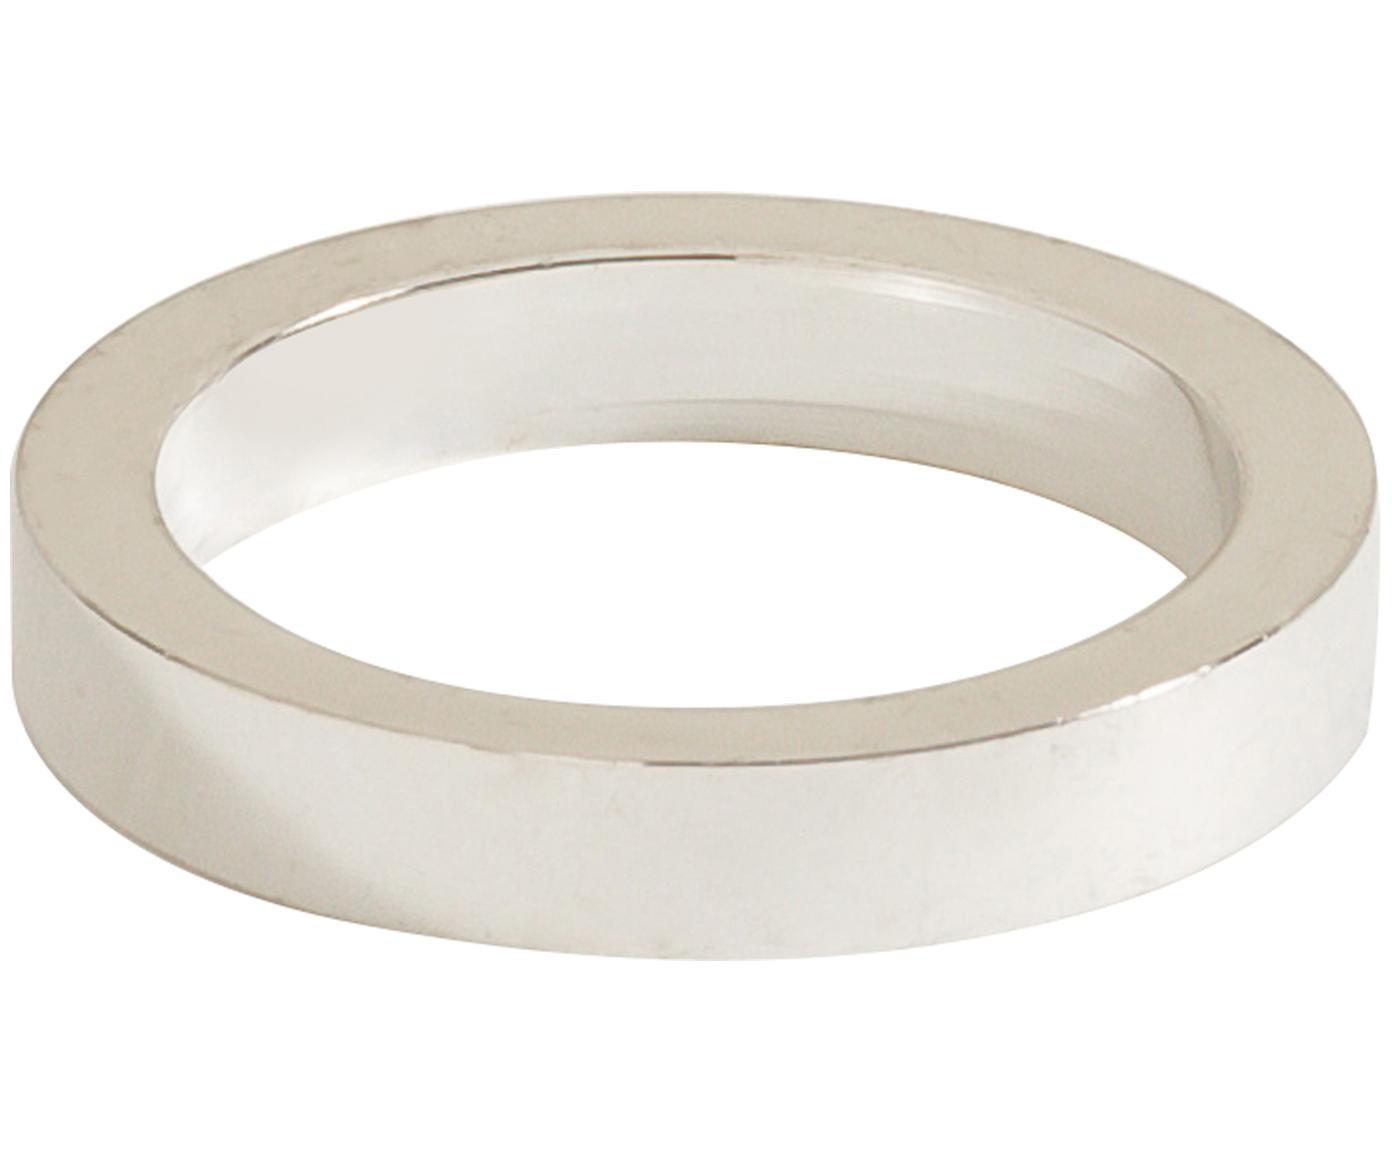 Serviettenringe Vasa, 4 Stück, Metall, Silberfarben, Ø 5 cm